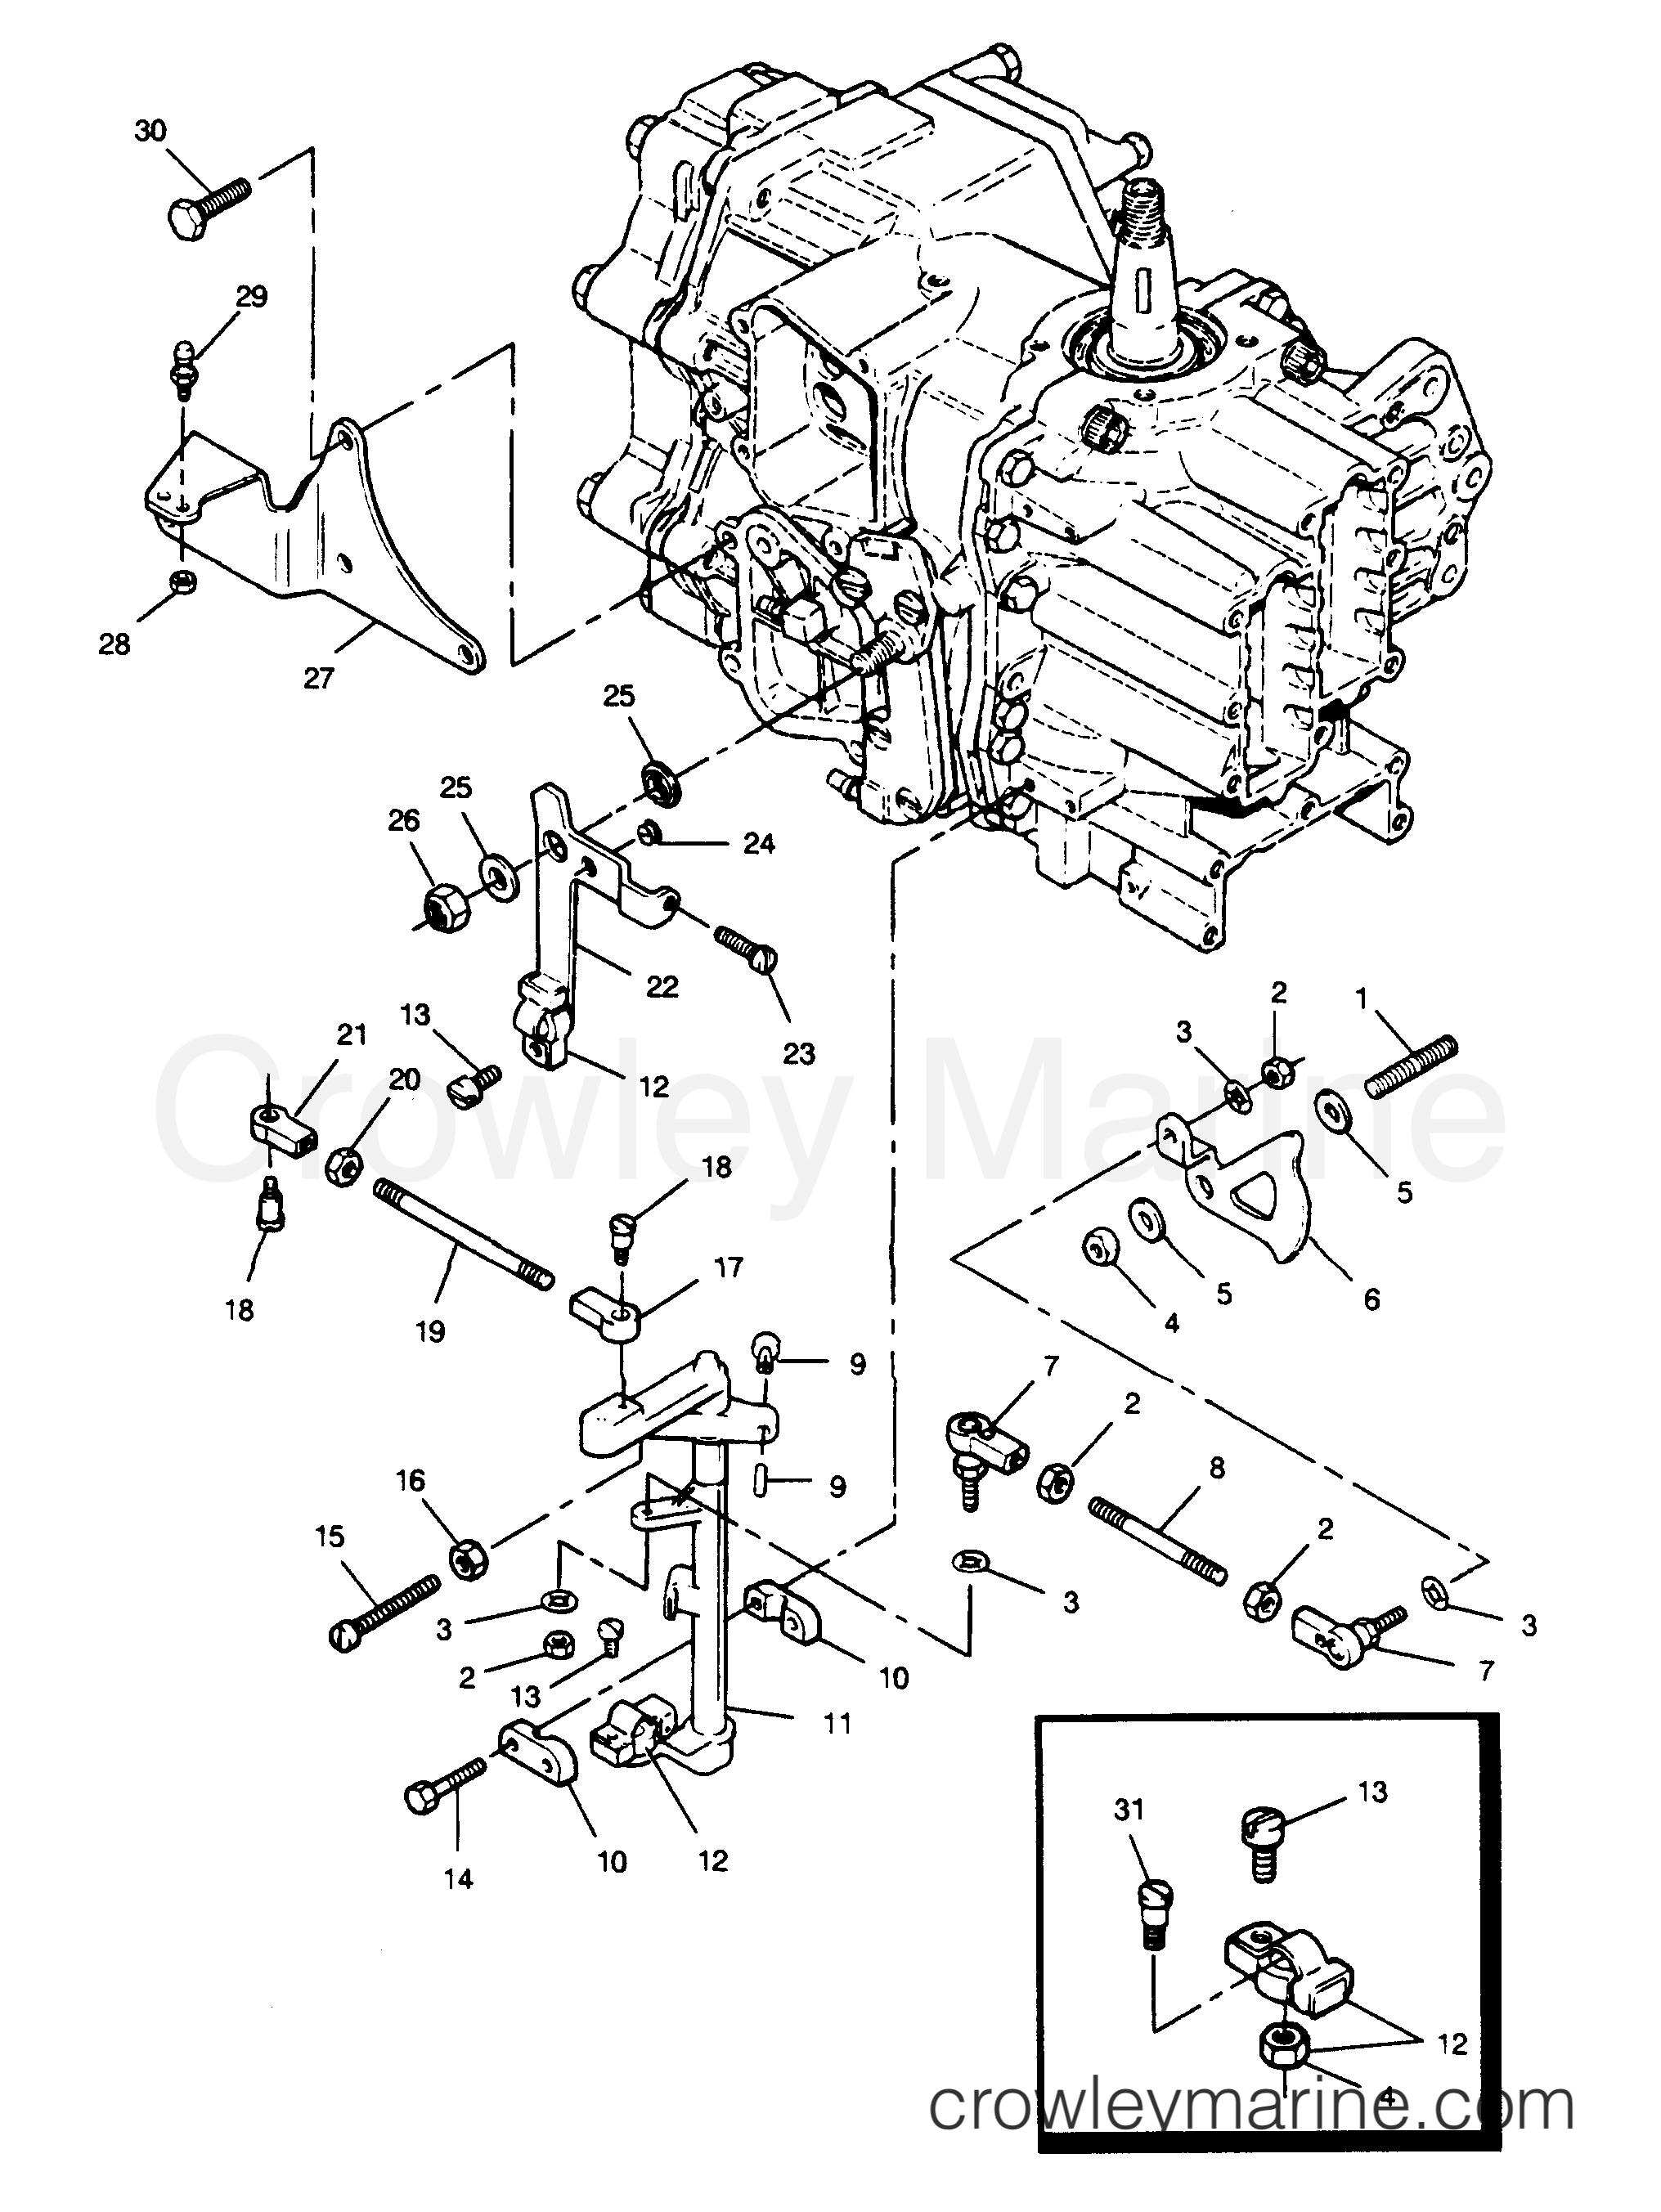 A9Wo1A1Y diagram of 1990 mercury marine mercury outboard 12004120d fuel pump